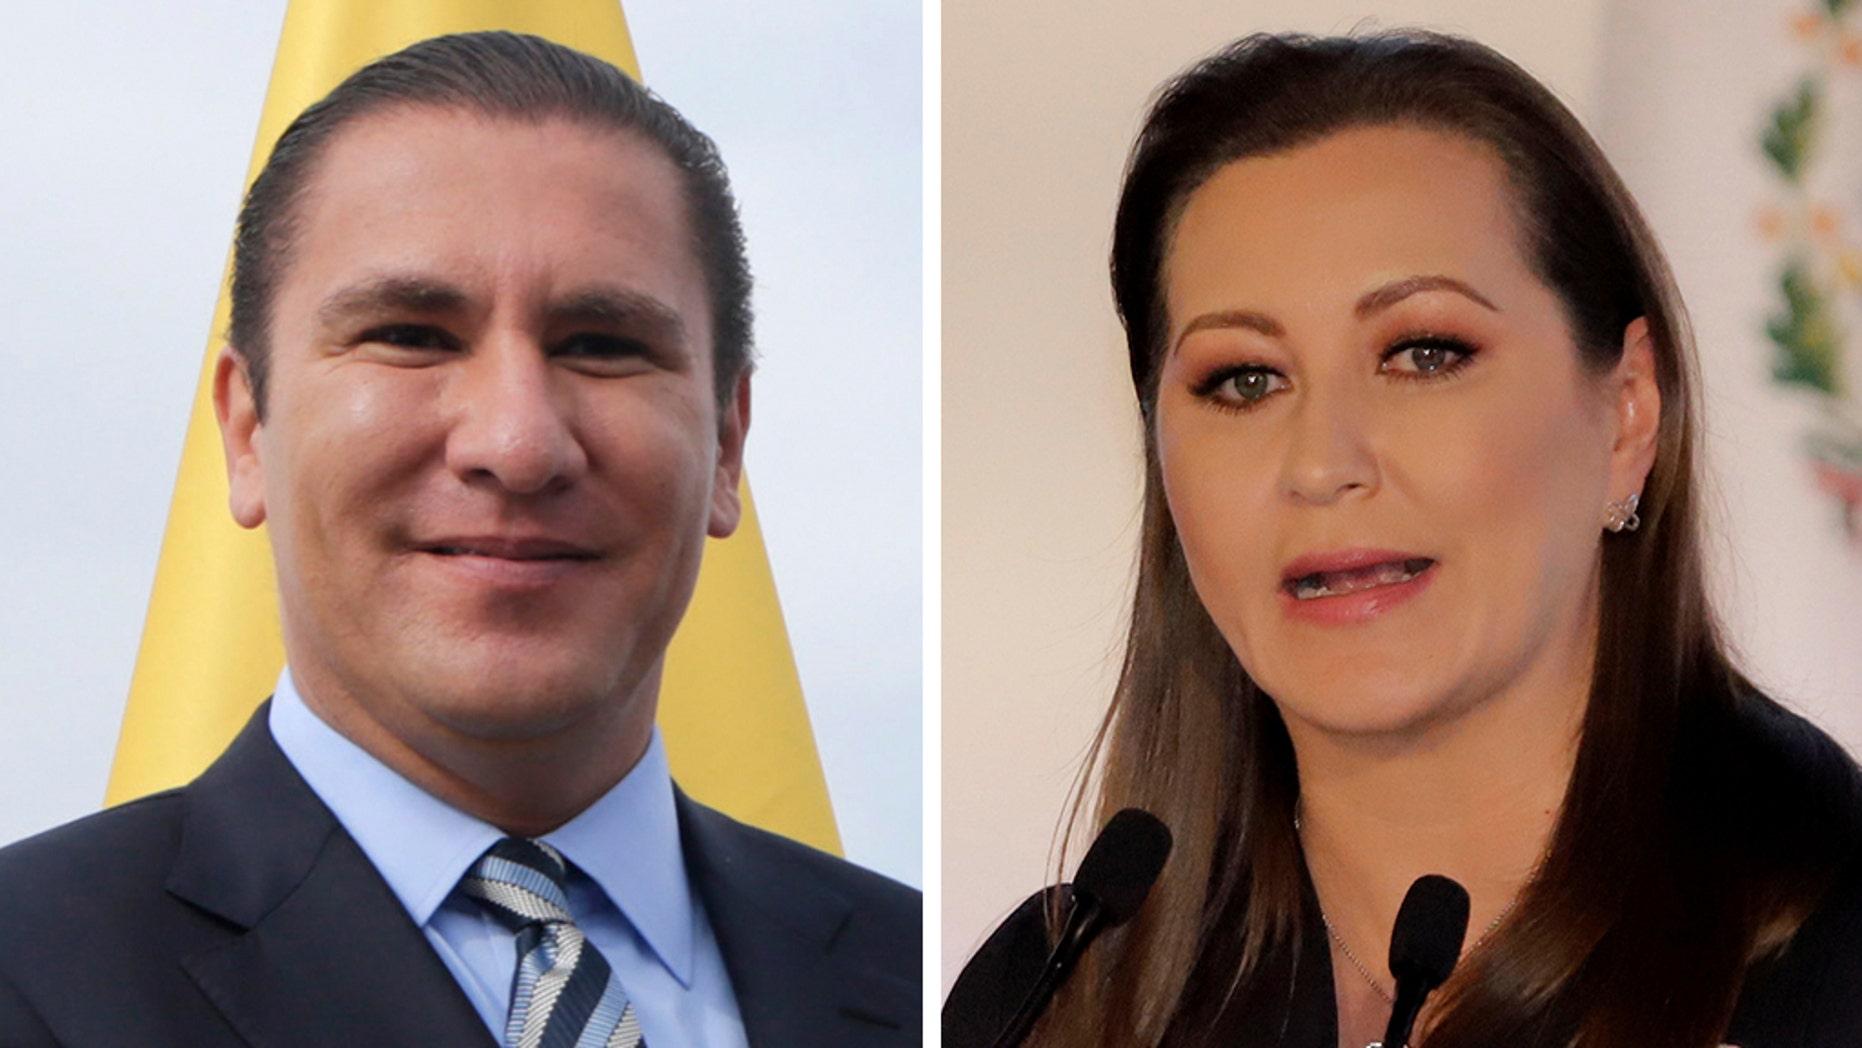 Rafael Moreno Valle, left, and Puebla Governor Martha Erika Alonso